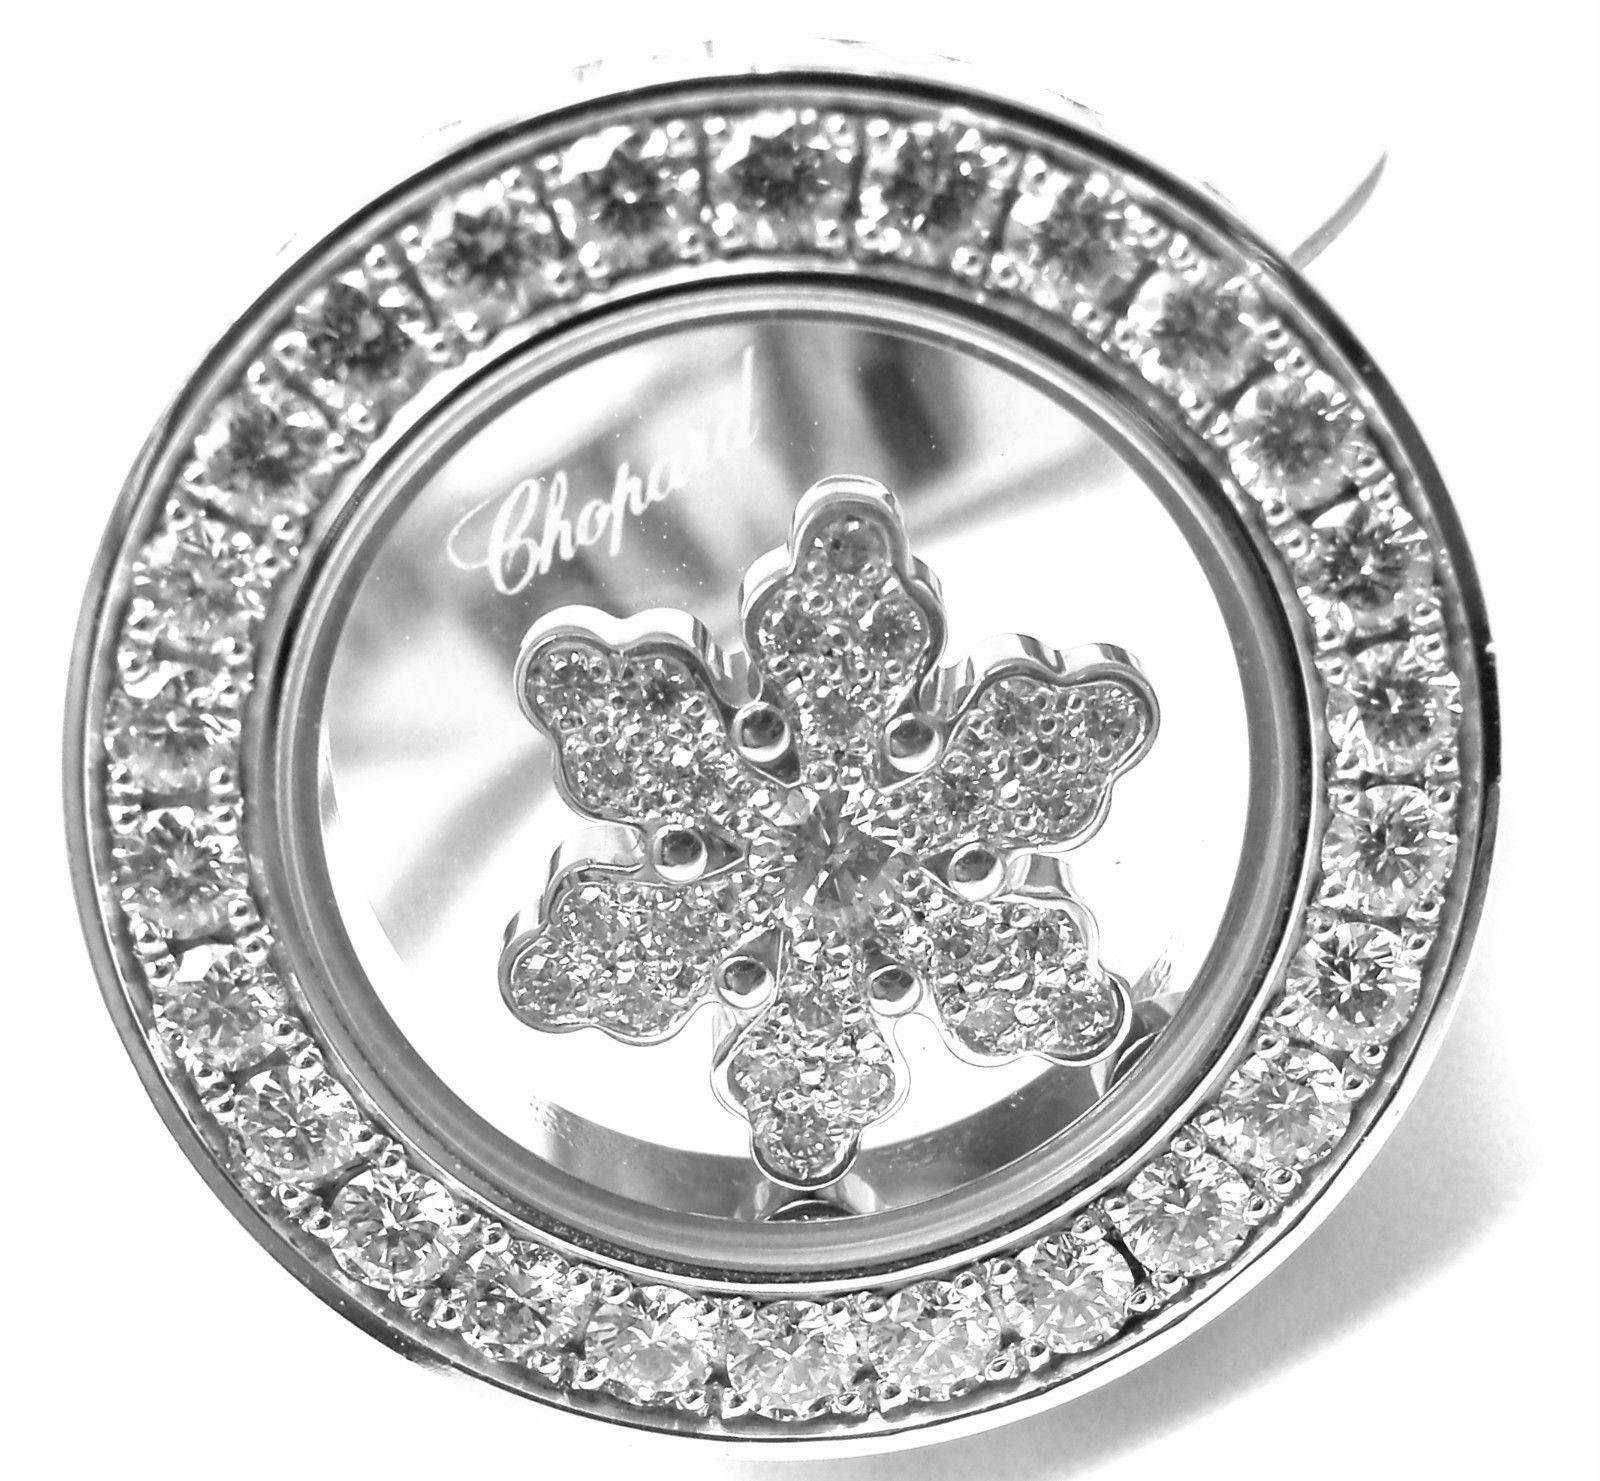 CHOPARD 18K WHITE GOLD HAPPY DIAMOND SNOWFLAKE RING